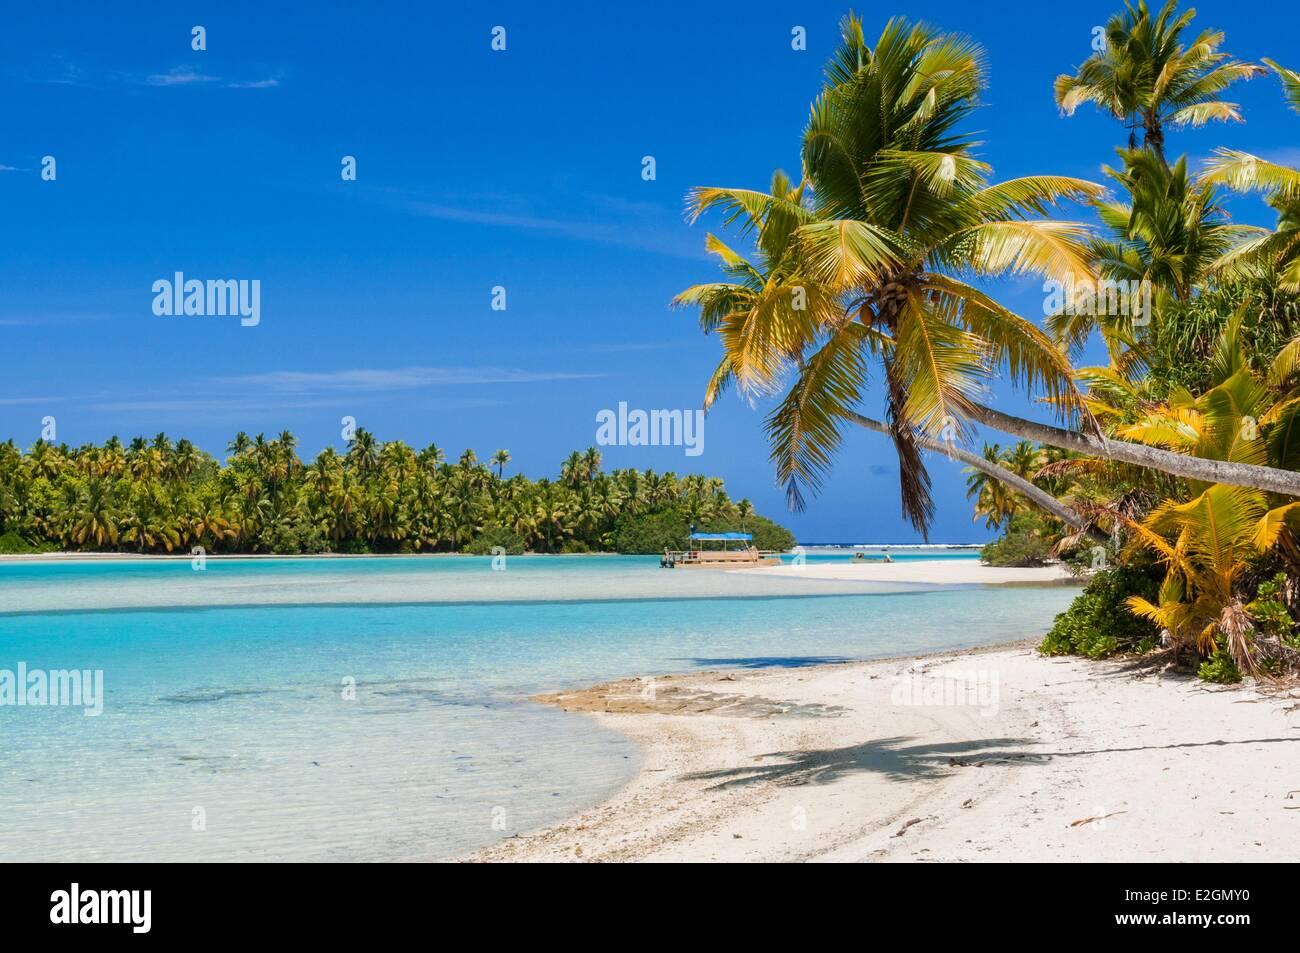 Cook Islands Aitutaki Island grand lagoon beach of One Foot Island atoll also called Tapuaetai - Stock Image